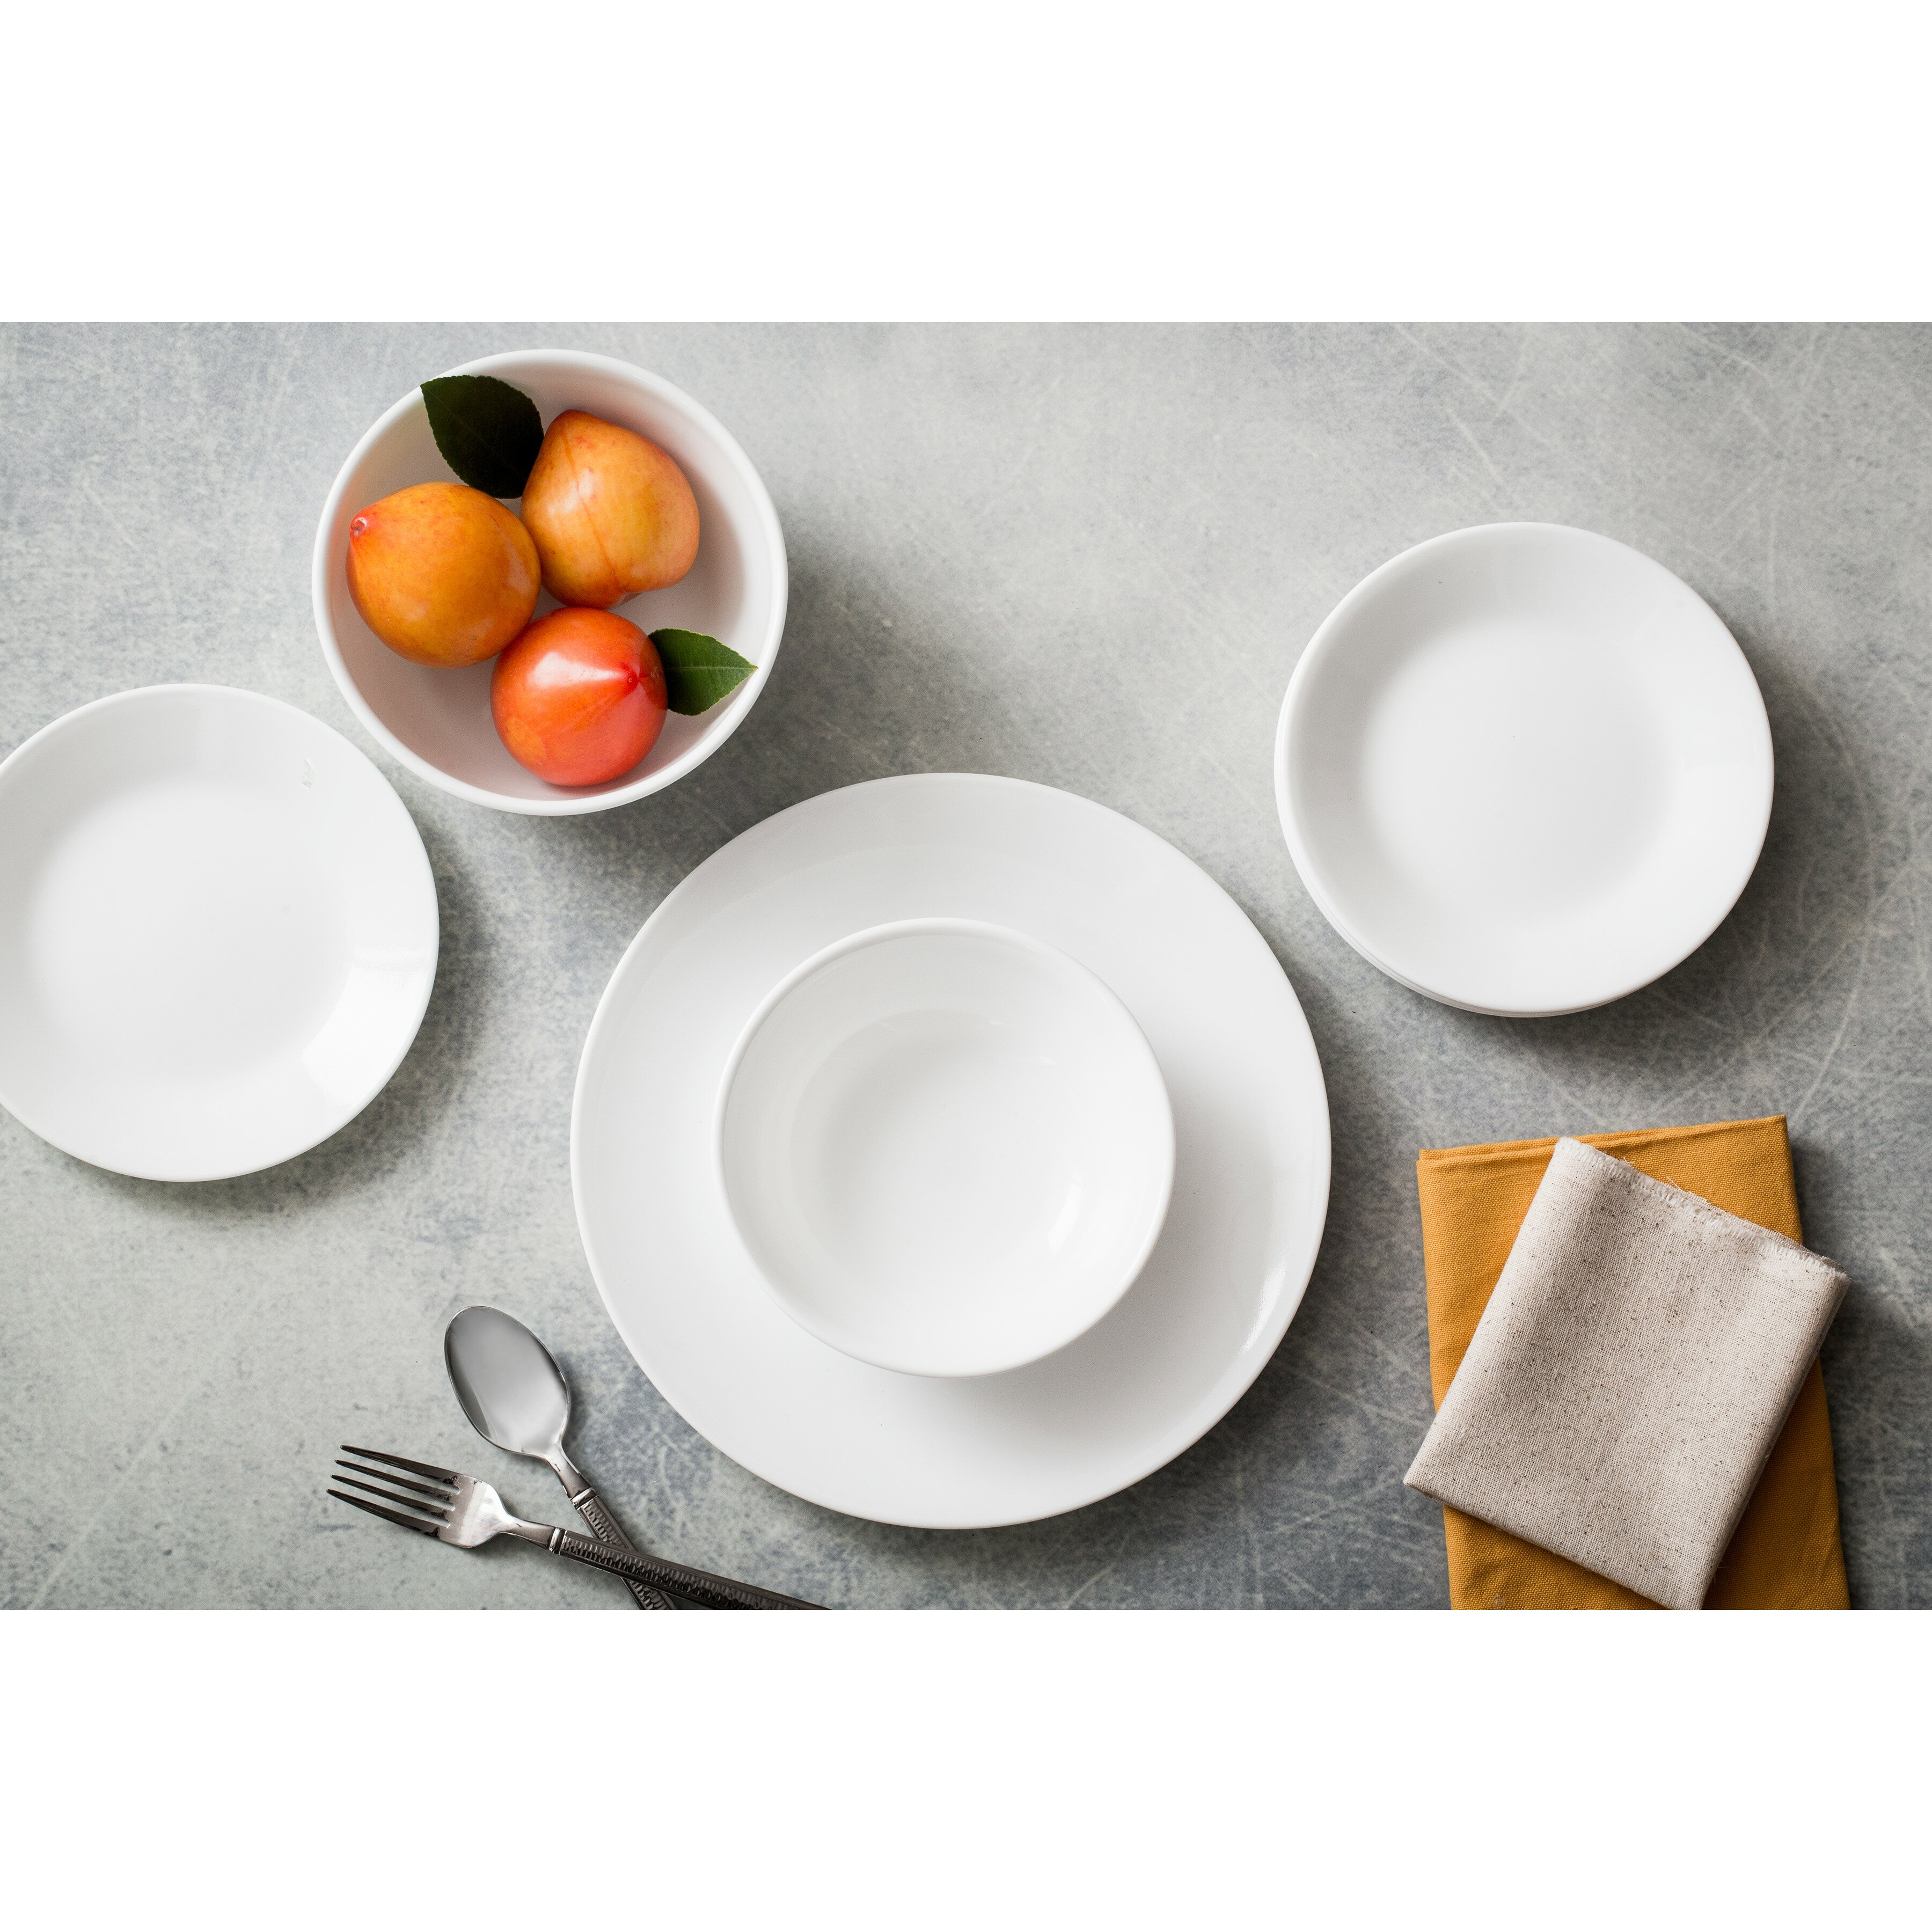 Corelle Corelle Livingware 74 Piece Dinnerware Set